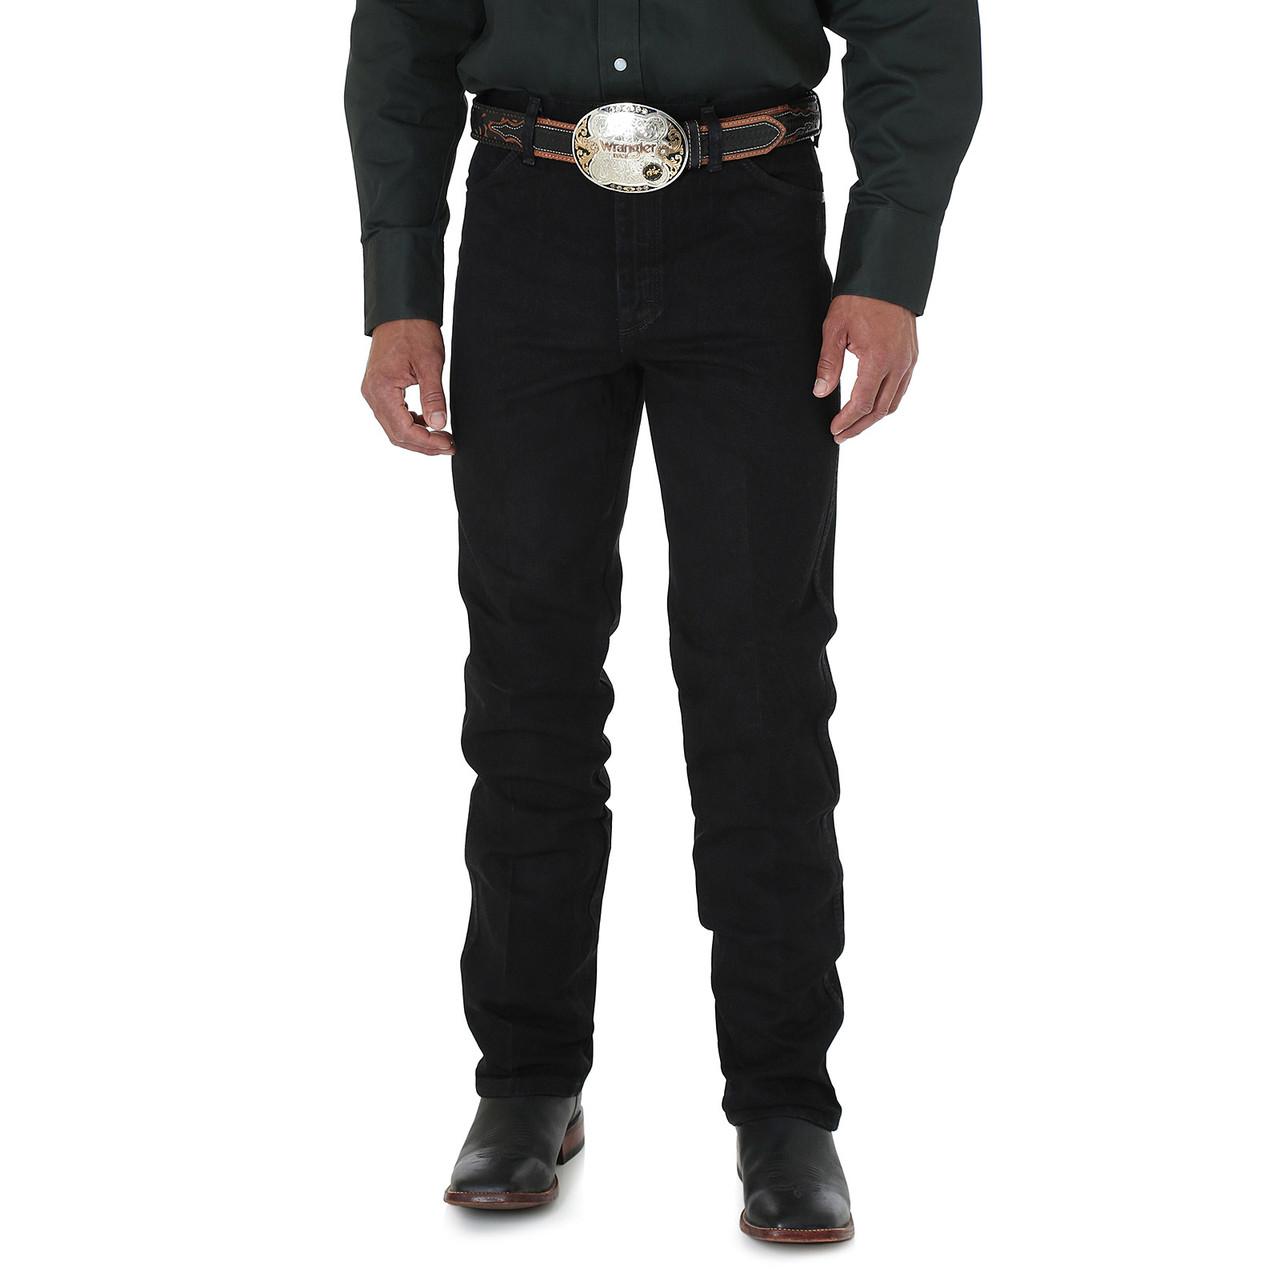 Джинсы Wrangler 933SEWK Cowboy Cut® Silver Edition Slim Fit